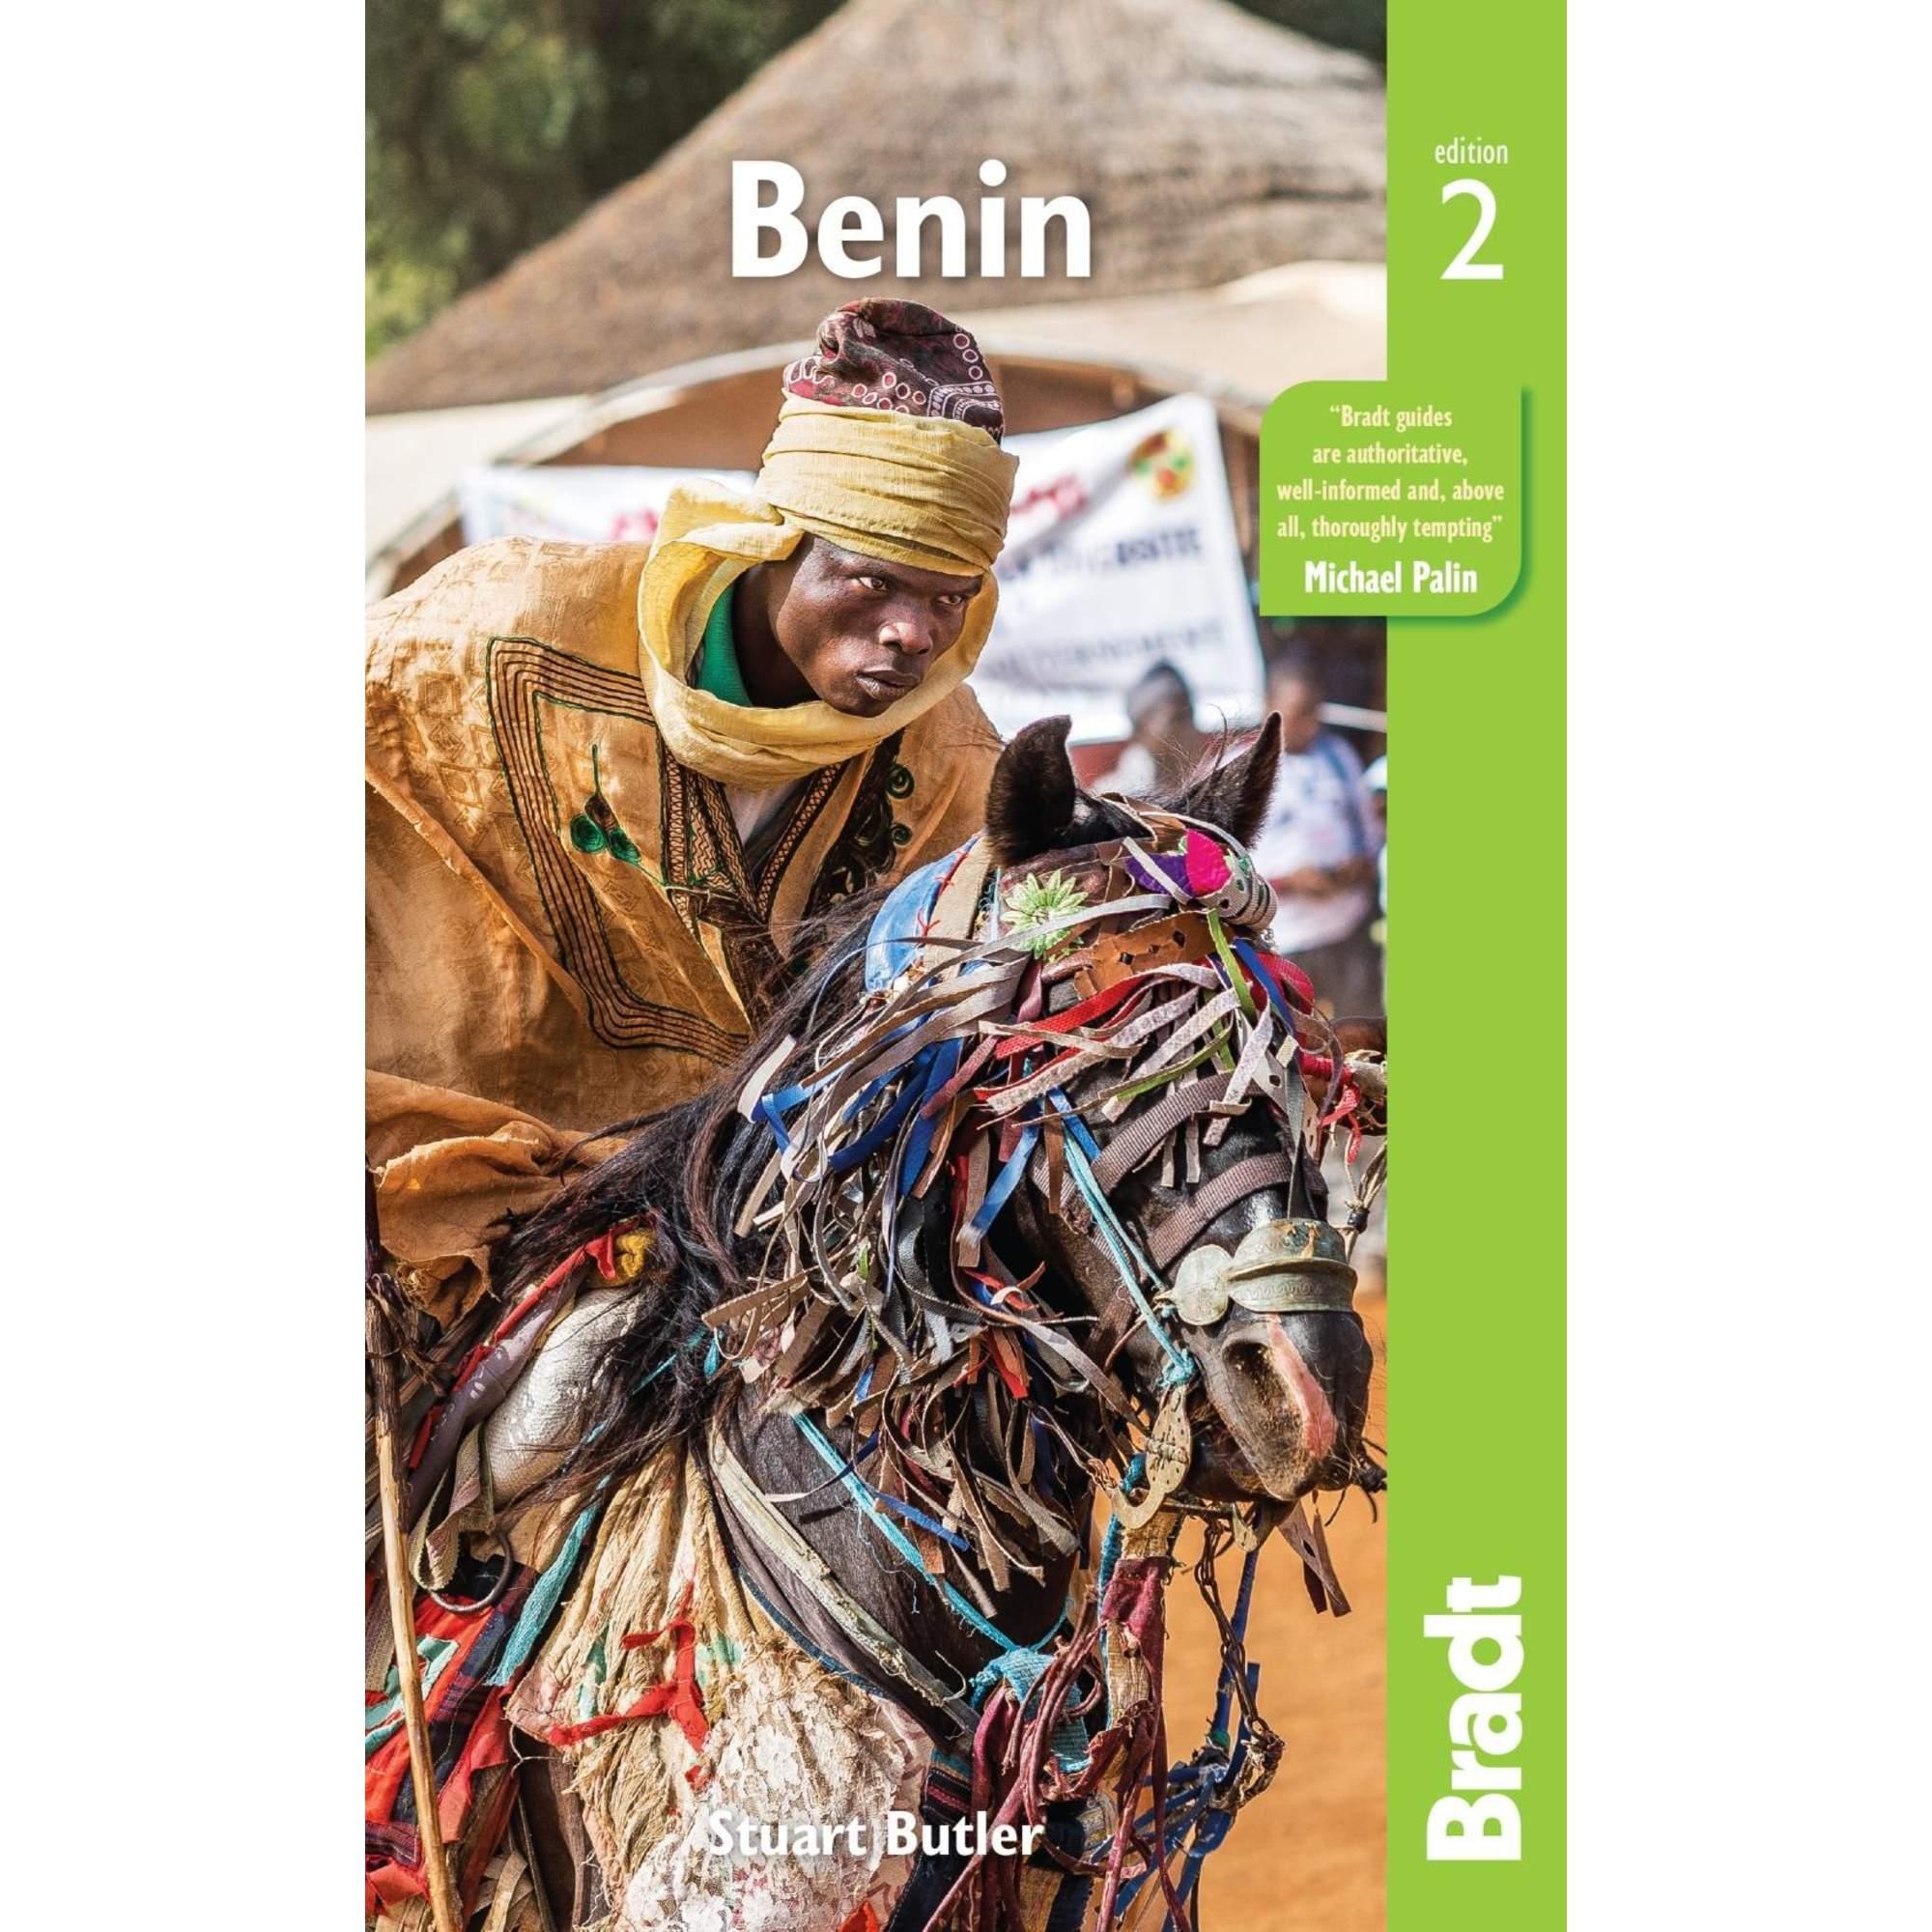 Benin, 24,50 Euro